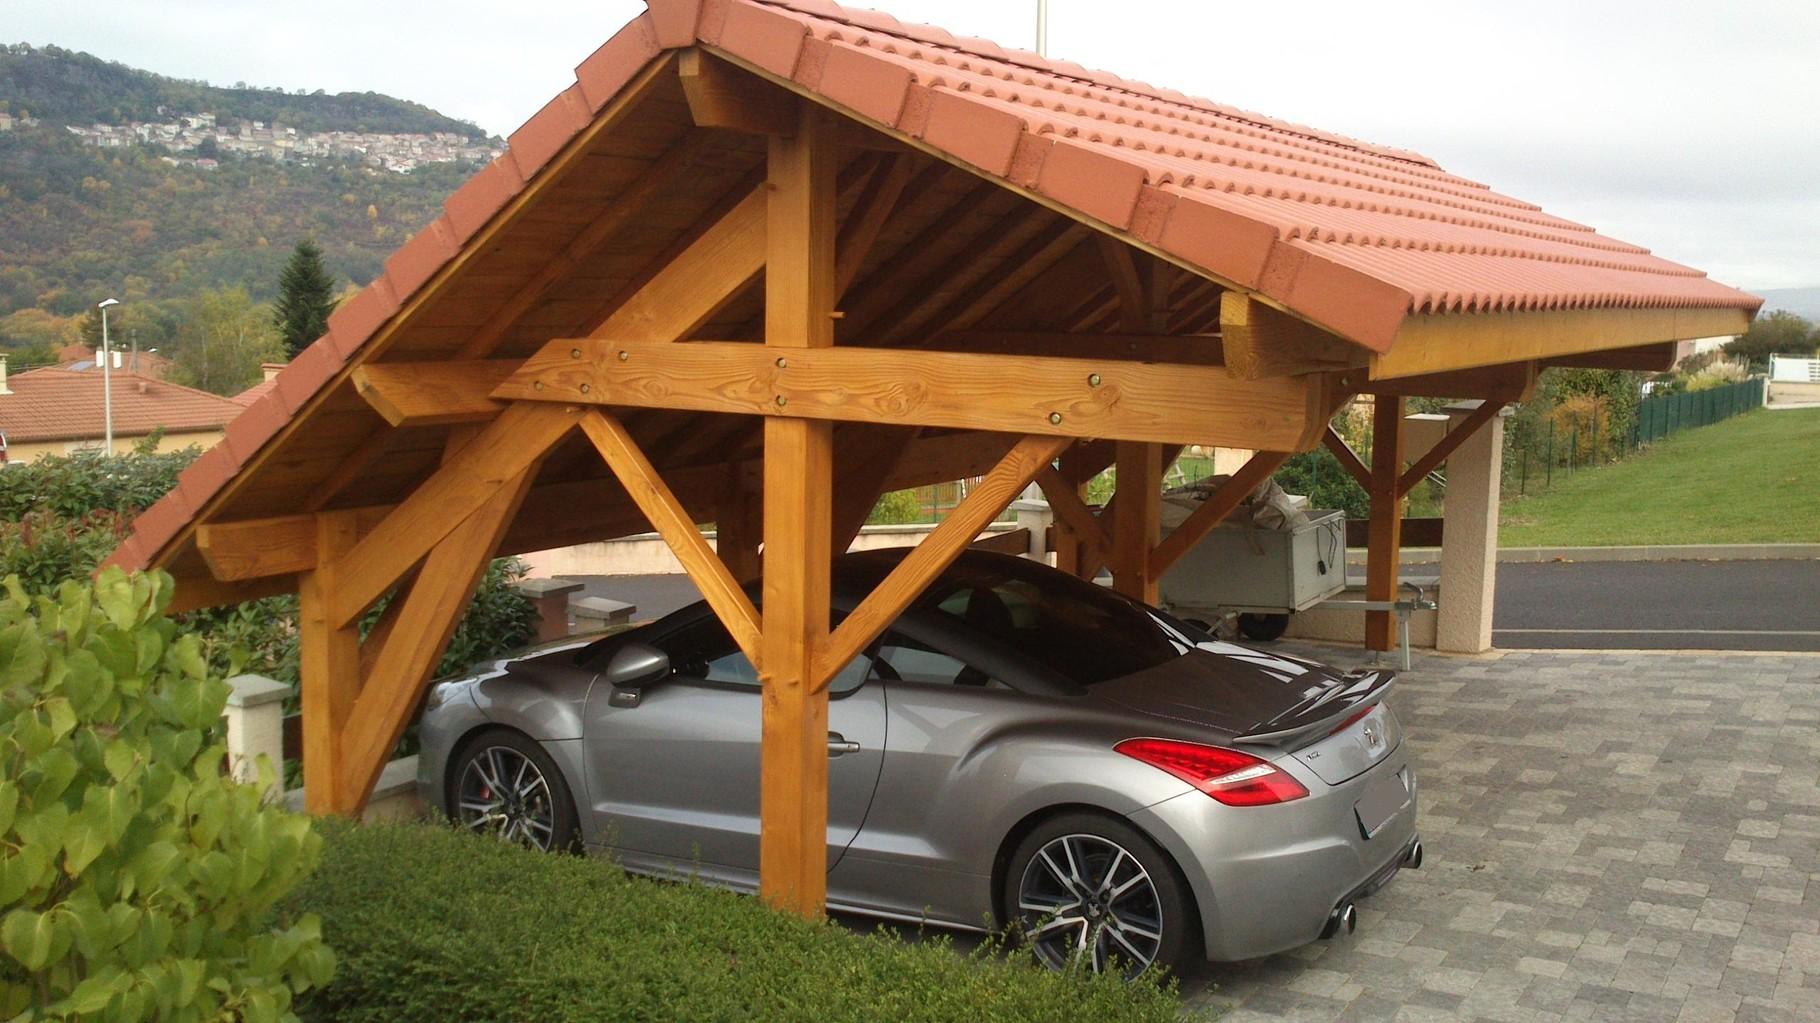 charpente bois garage camping car obtenez des id es de design int ressantes en. Black Bedroom Furniture Sets. Home Design Ideas